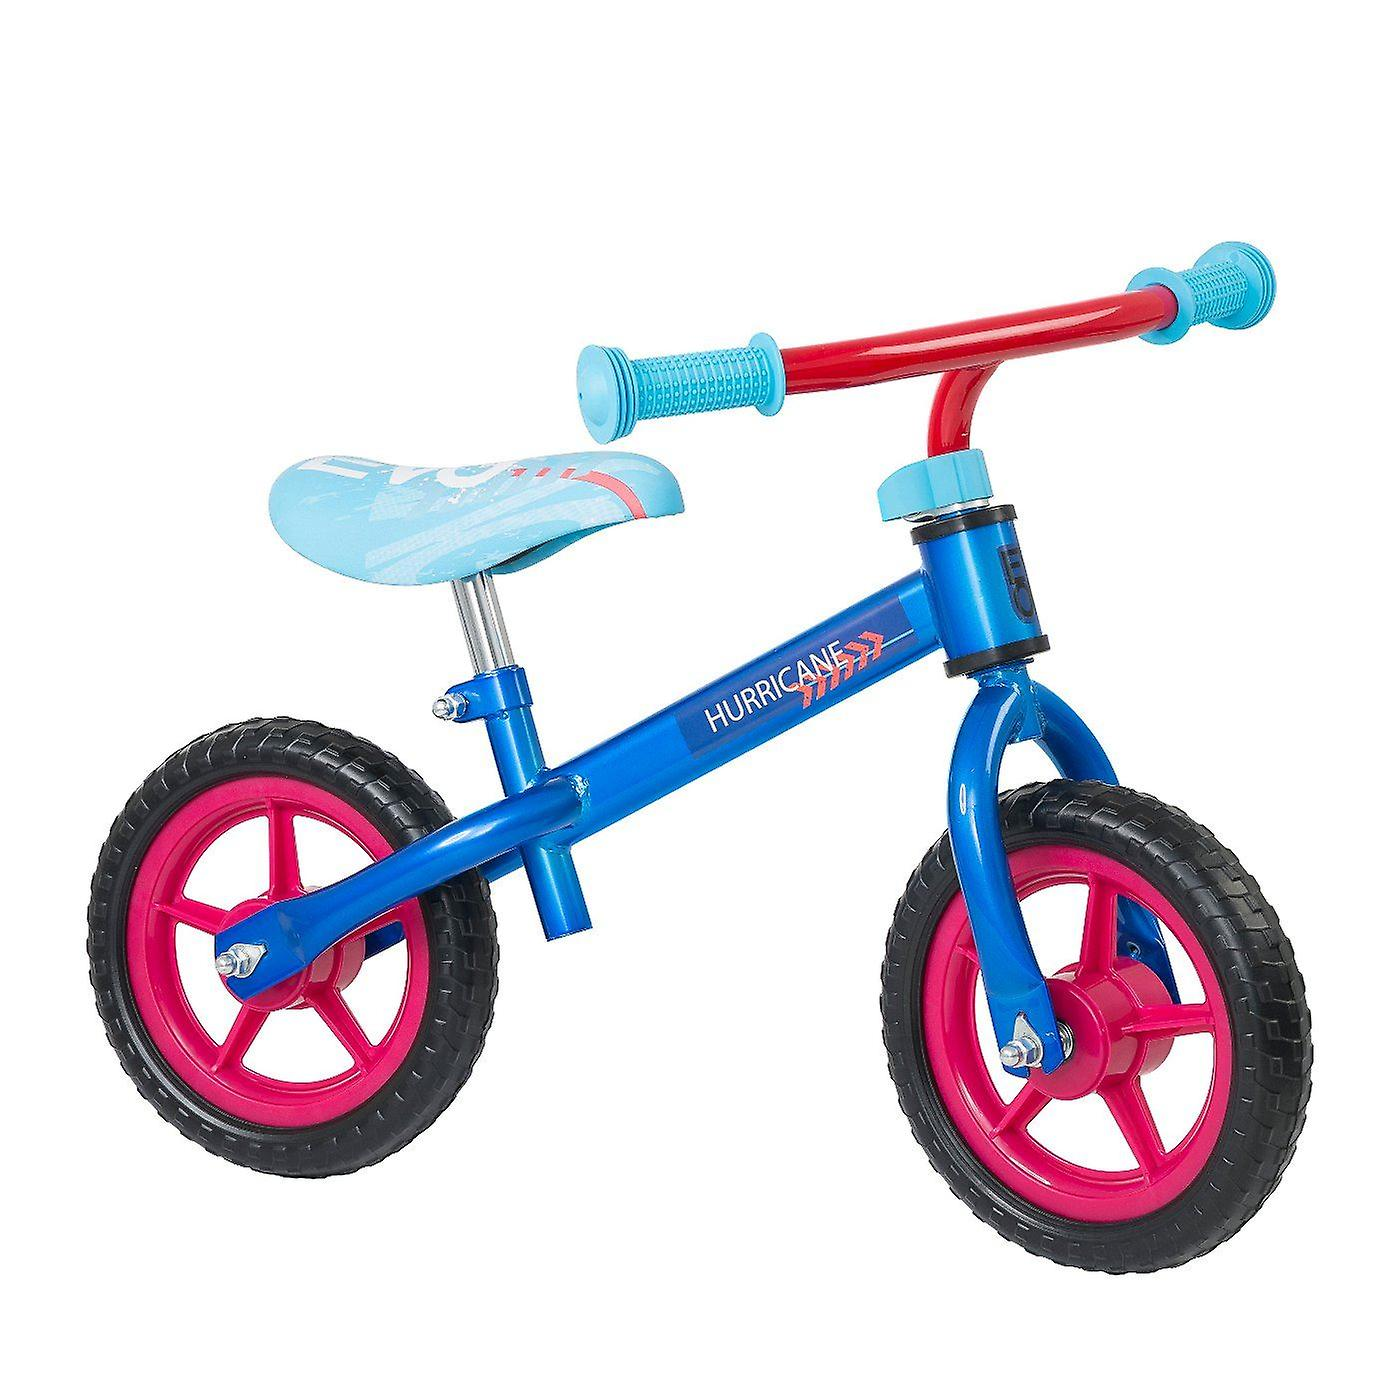 Bicicleta de entrenamiento Evo - Azul